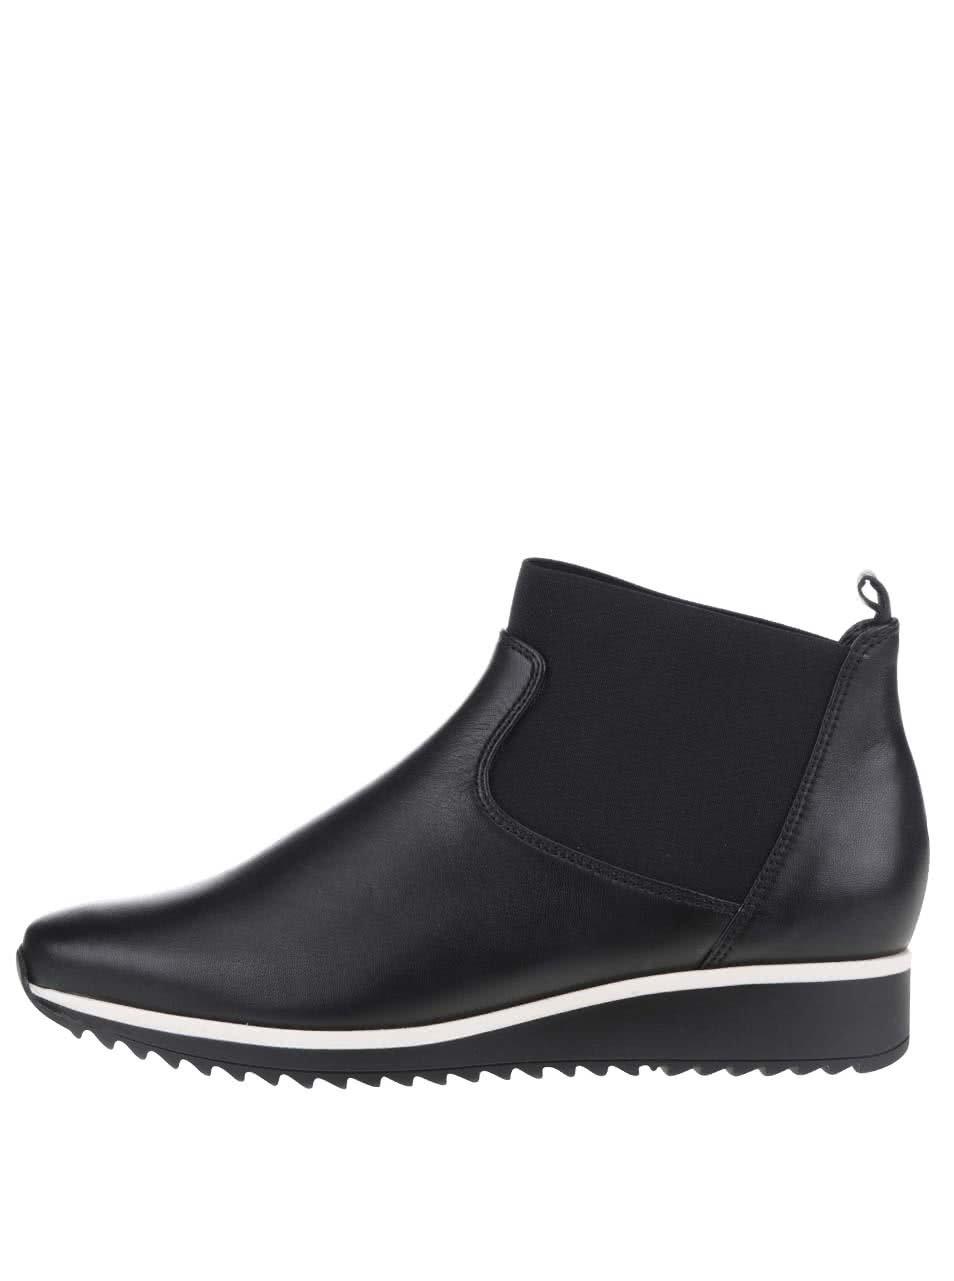 Čierne dámske kožené chelsea topánky Högl ... 38e3e34aa5b